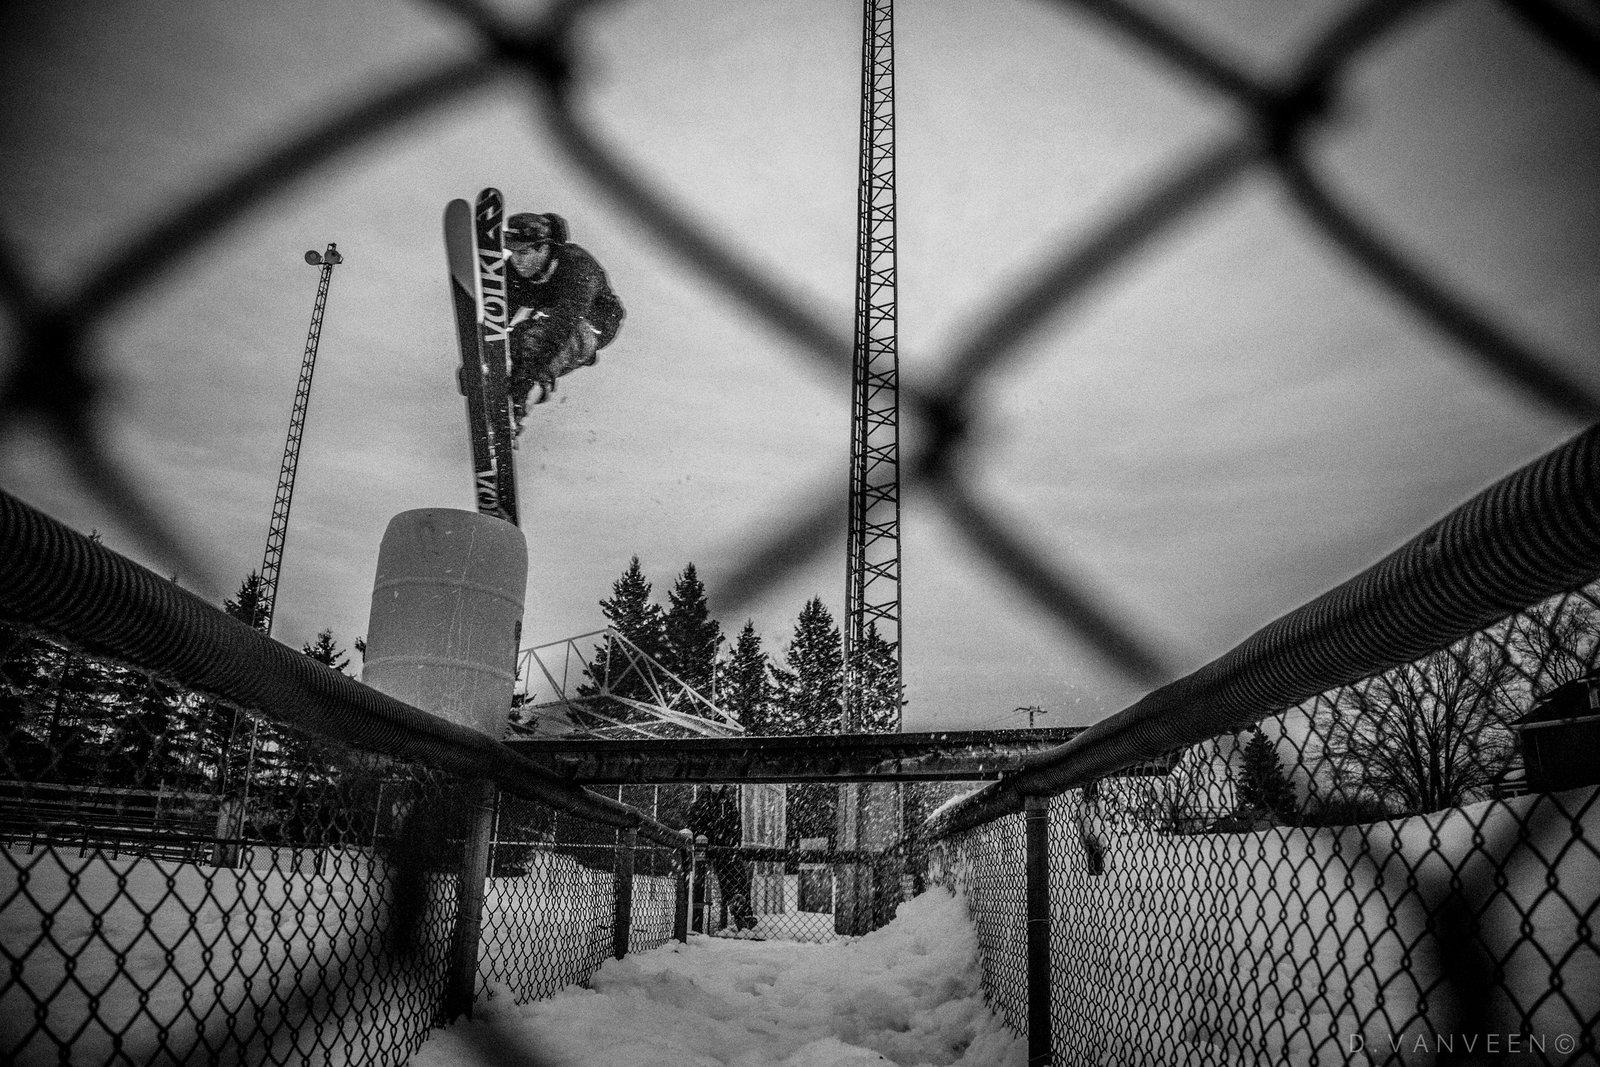 Through the fence.